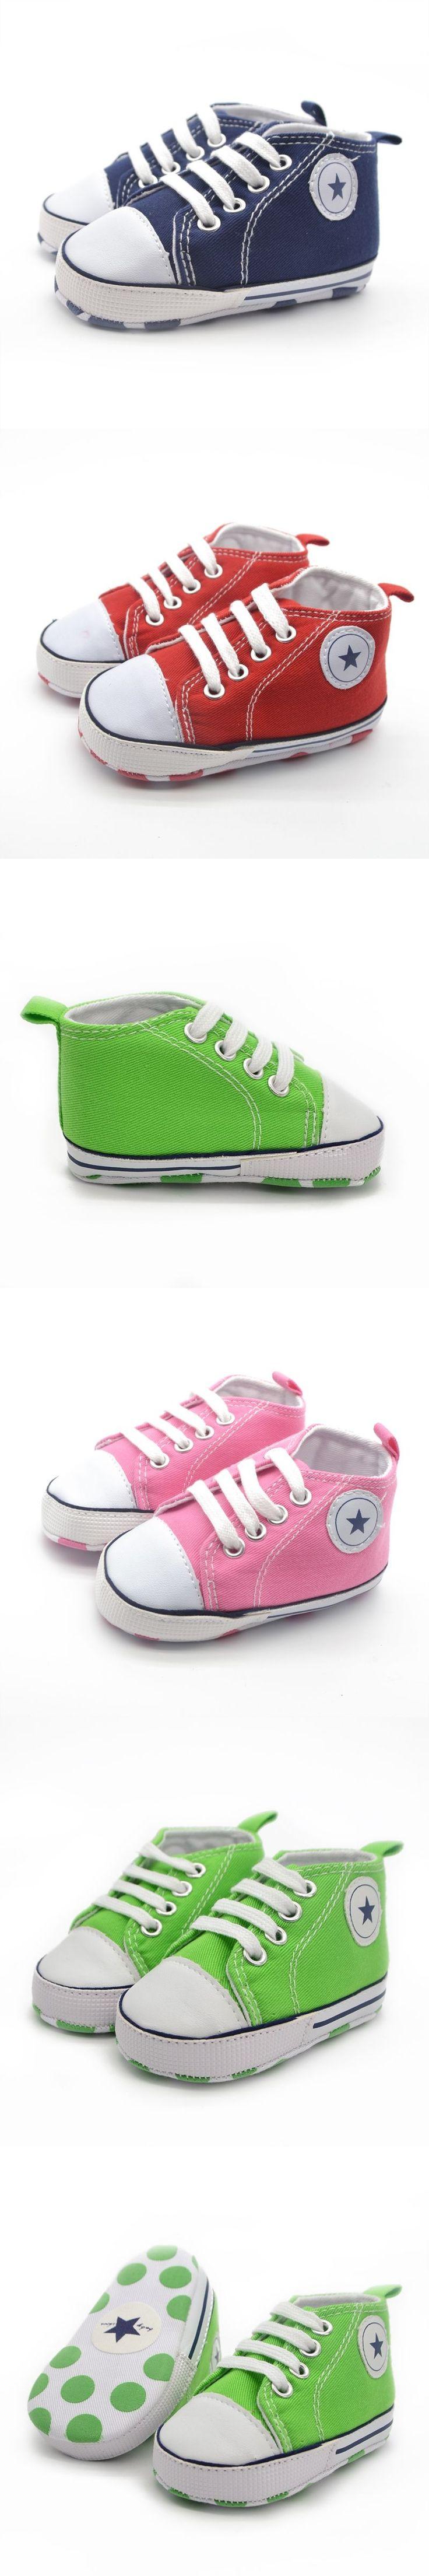 Infant Baby Boy Girls Soft Sole Sneaker Kids Prewalker Crib Shoes Trainers 0-18M